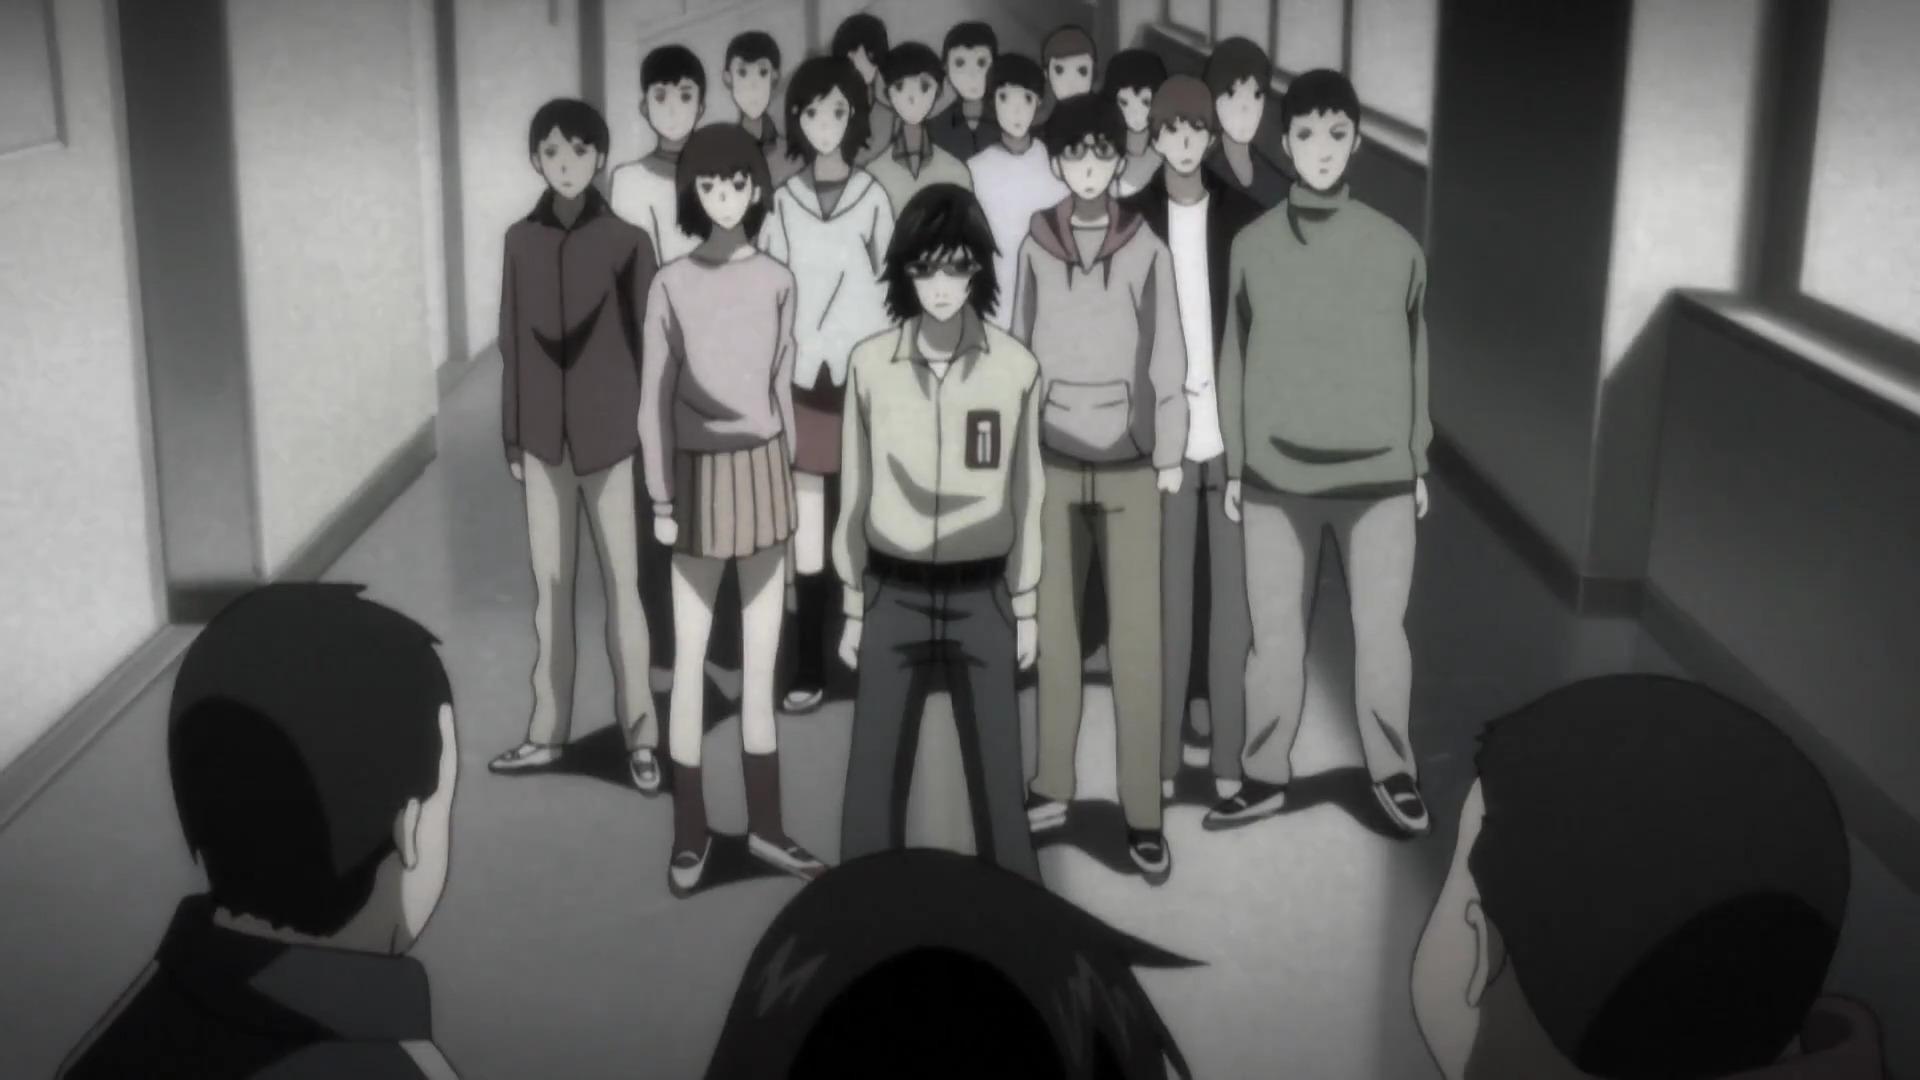 File:Teru stands up against bullies.jpg